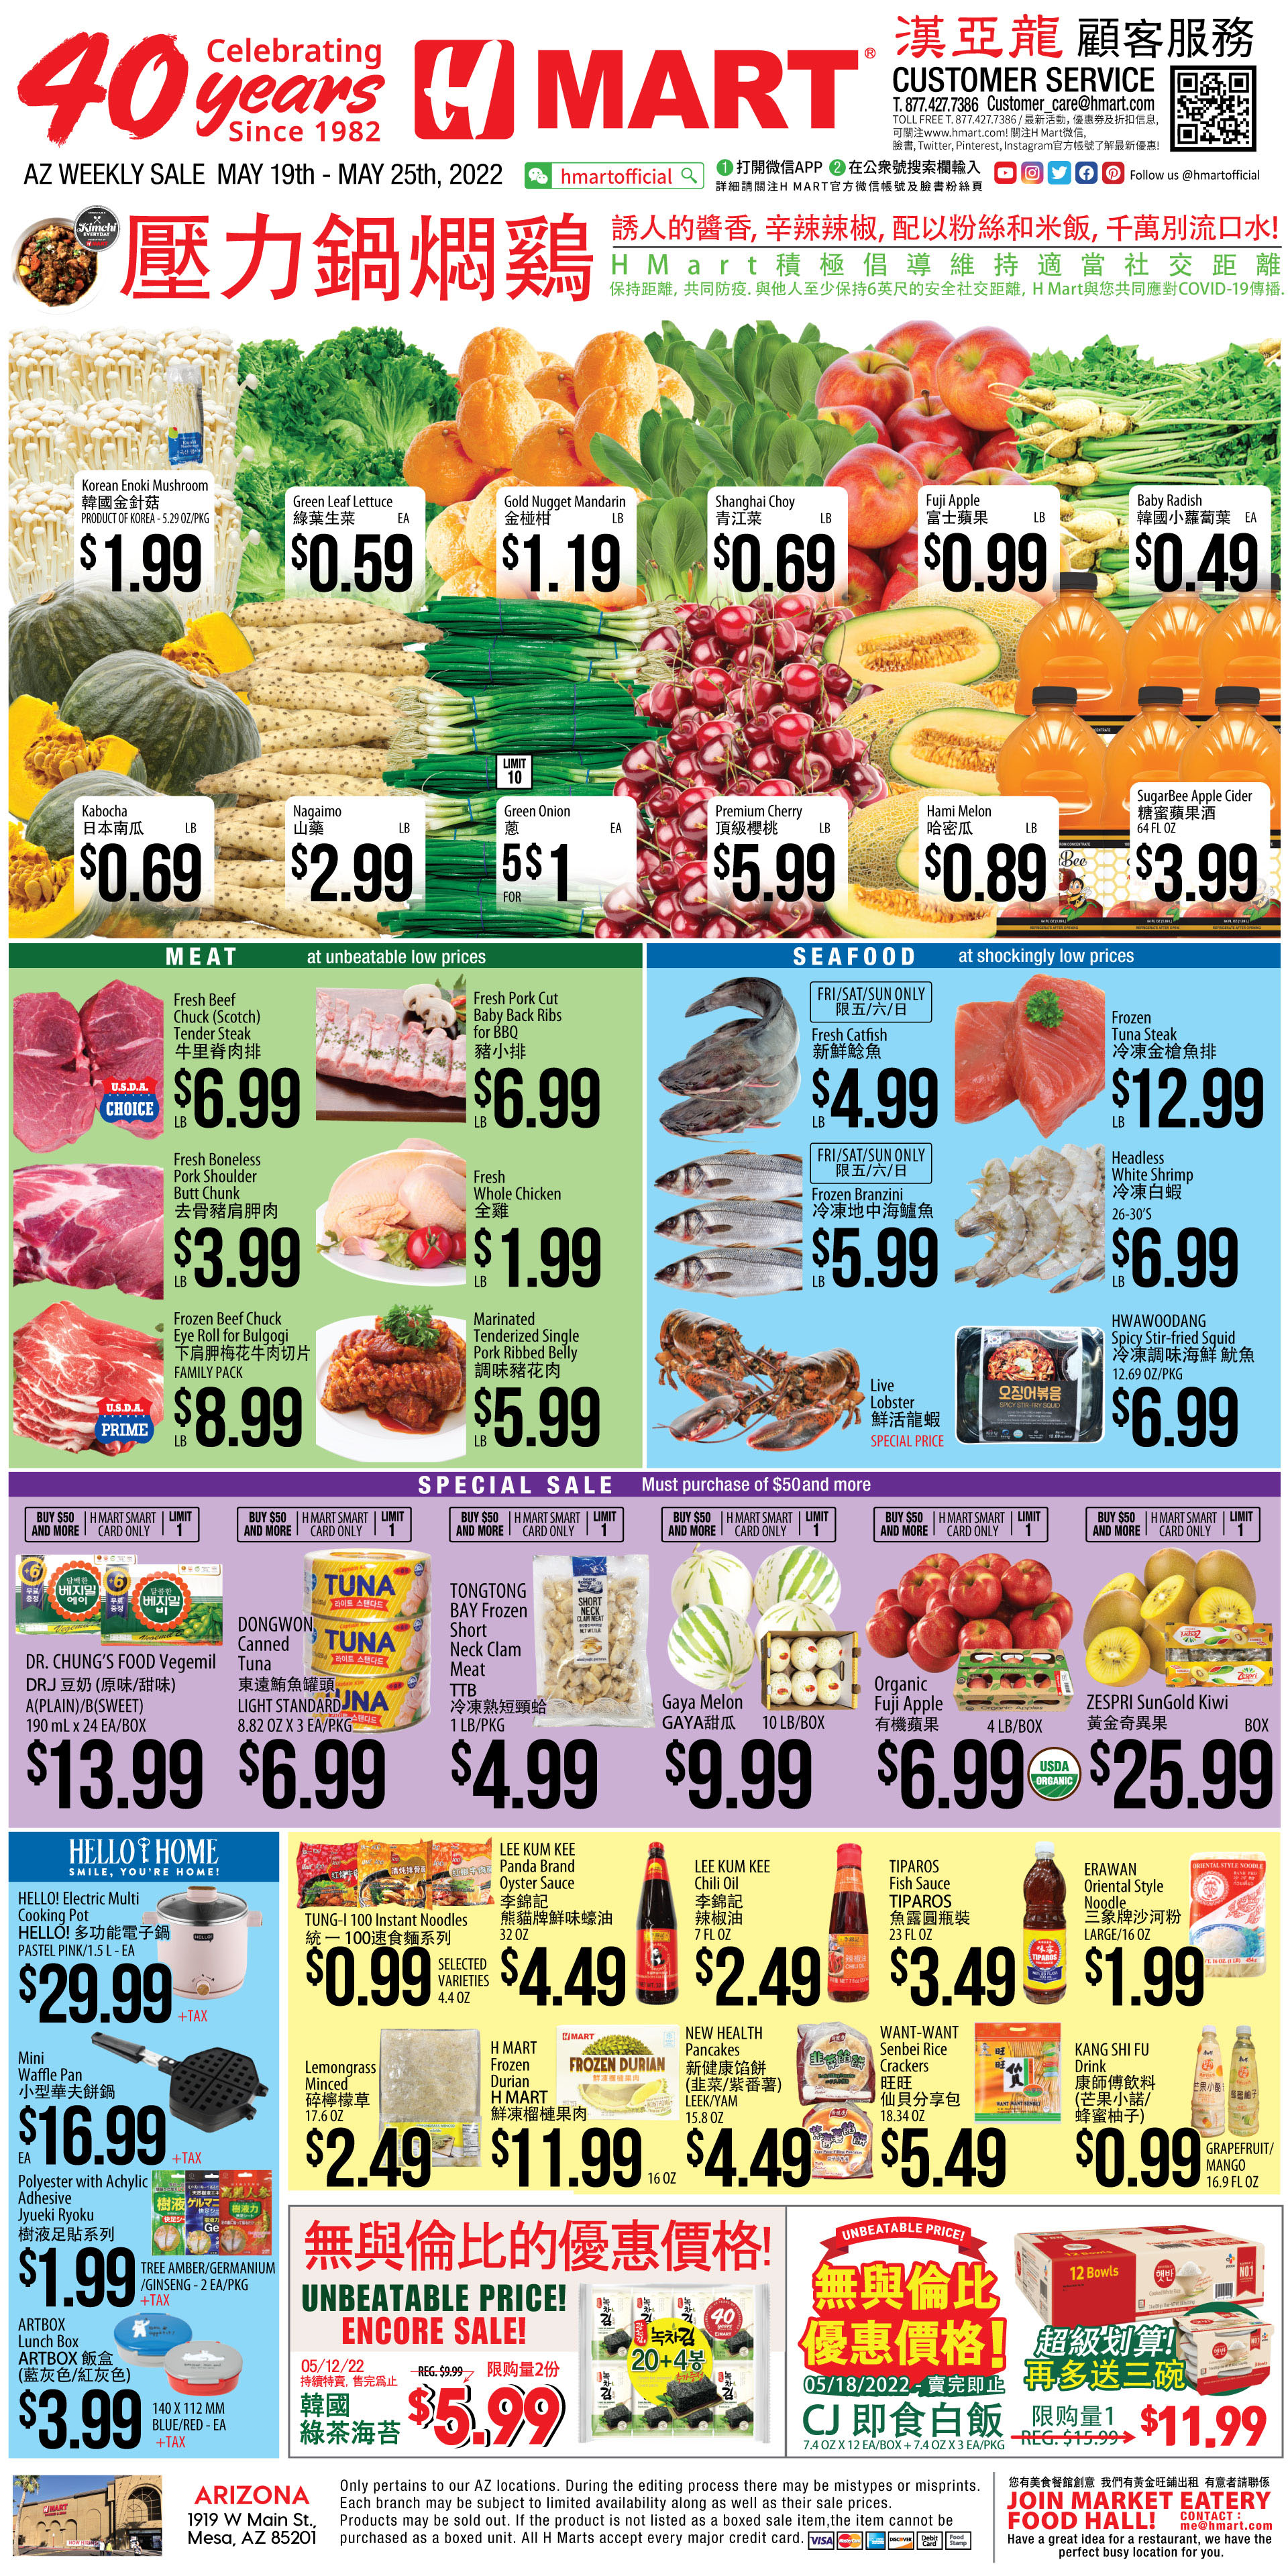 Weekly sales on Arizona